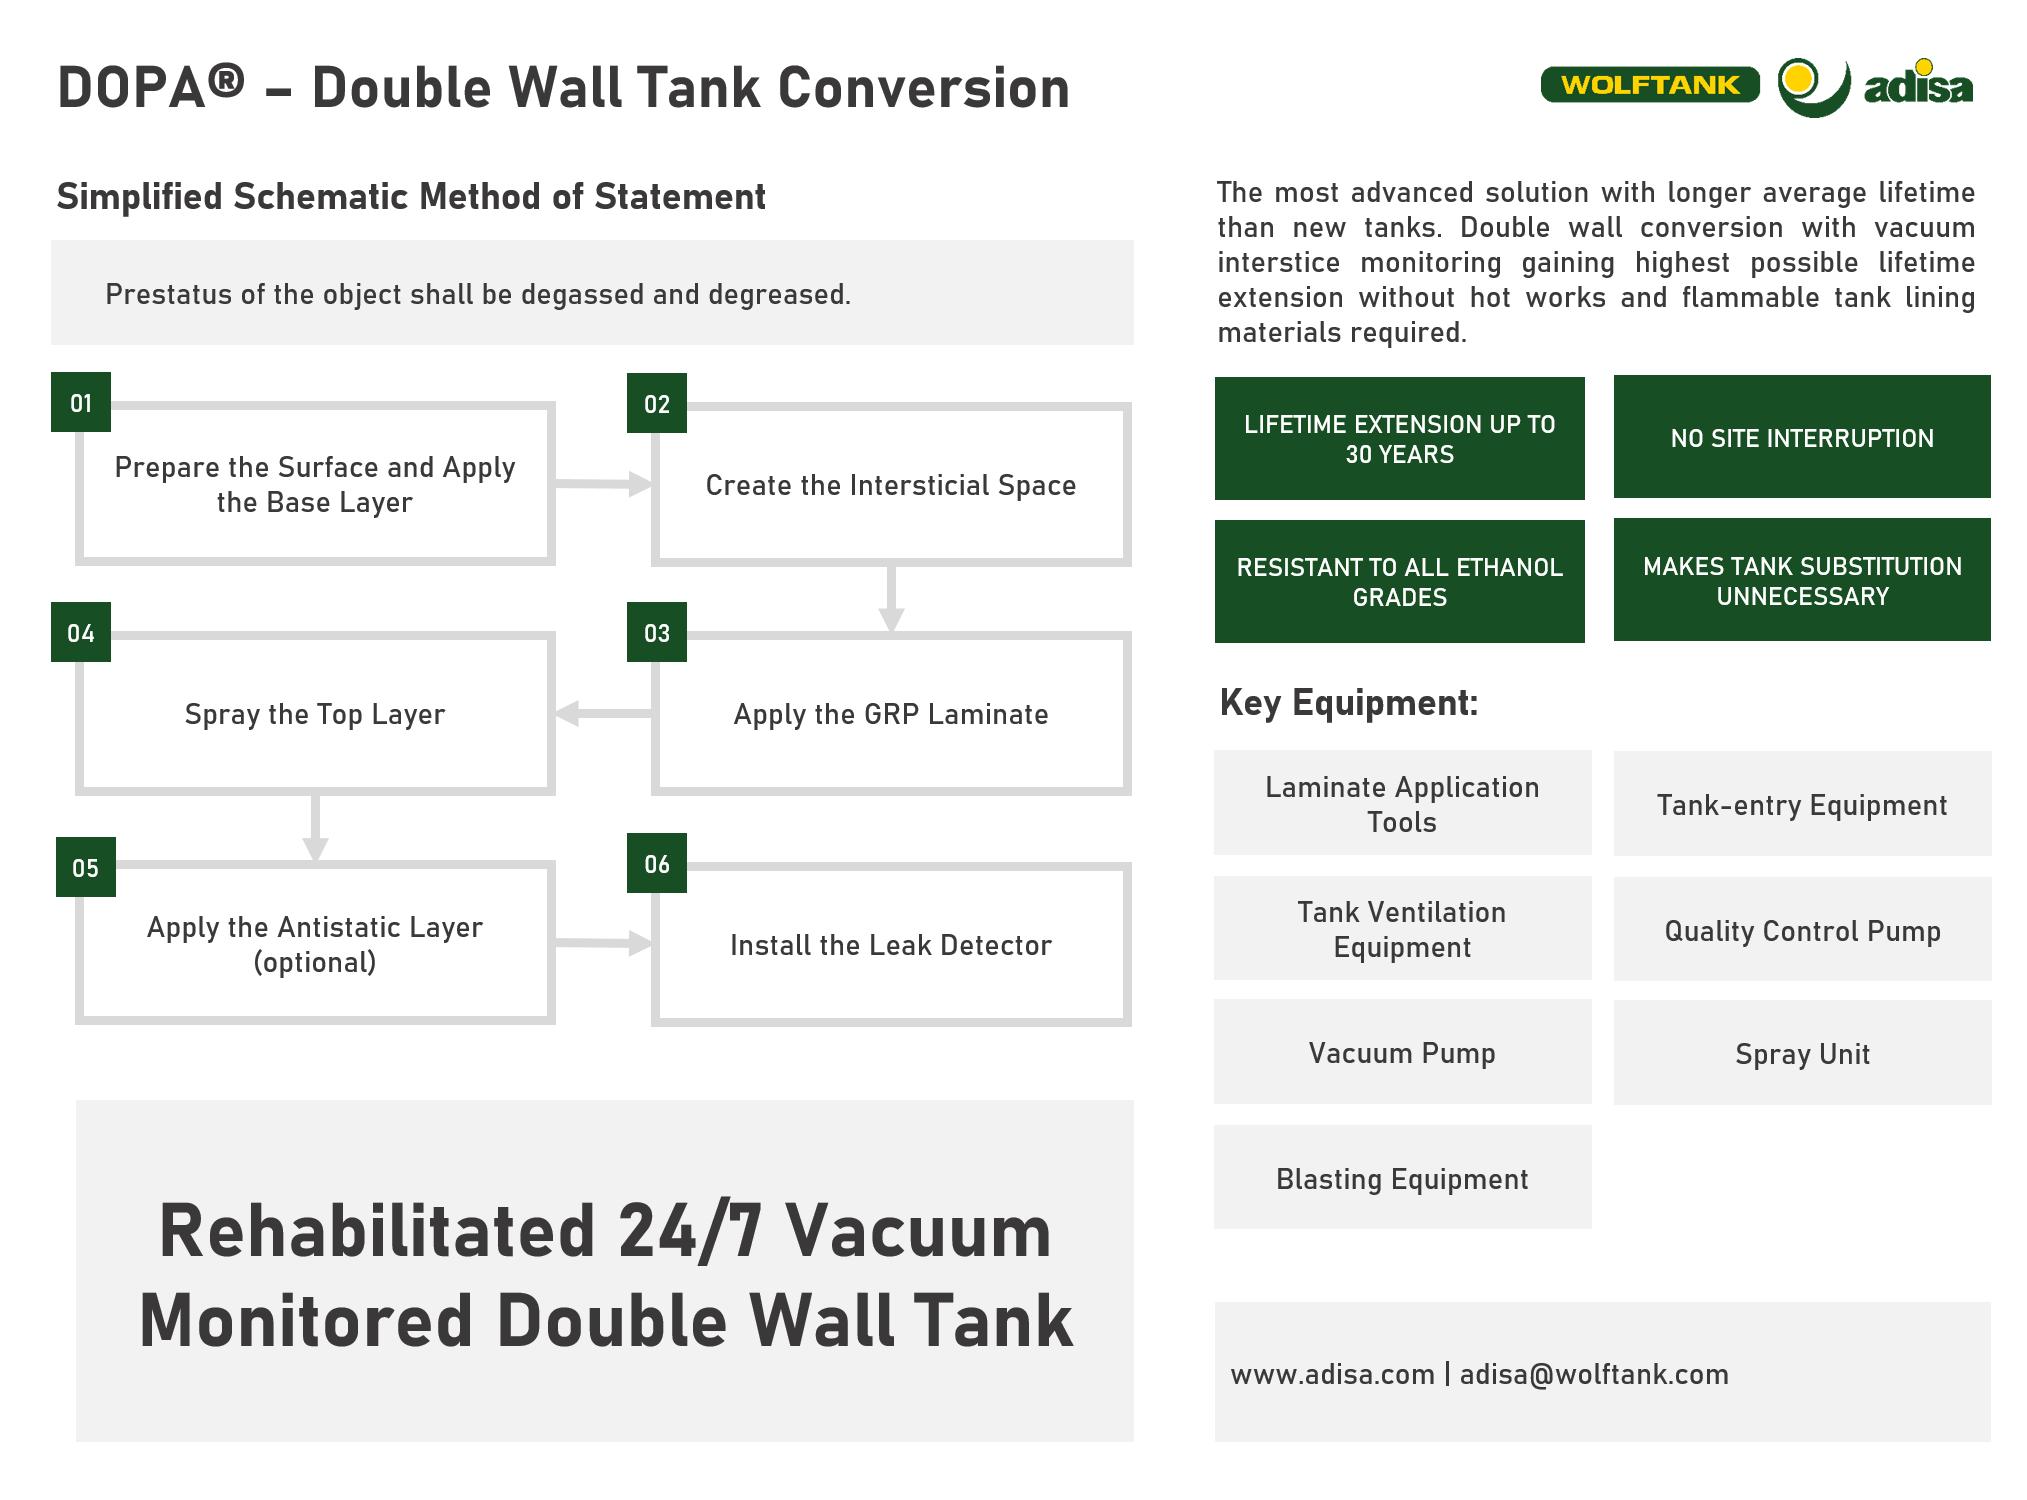 DOPA Double Wall Simple Method Statement - Wolftank Adisa